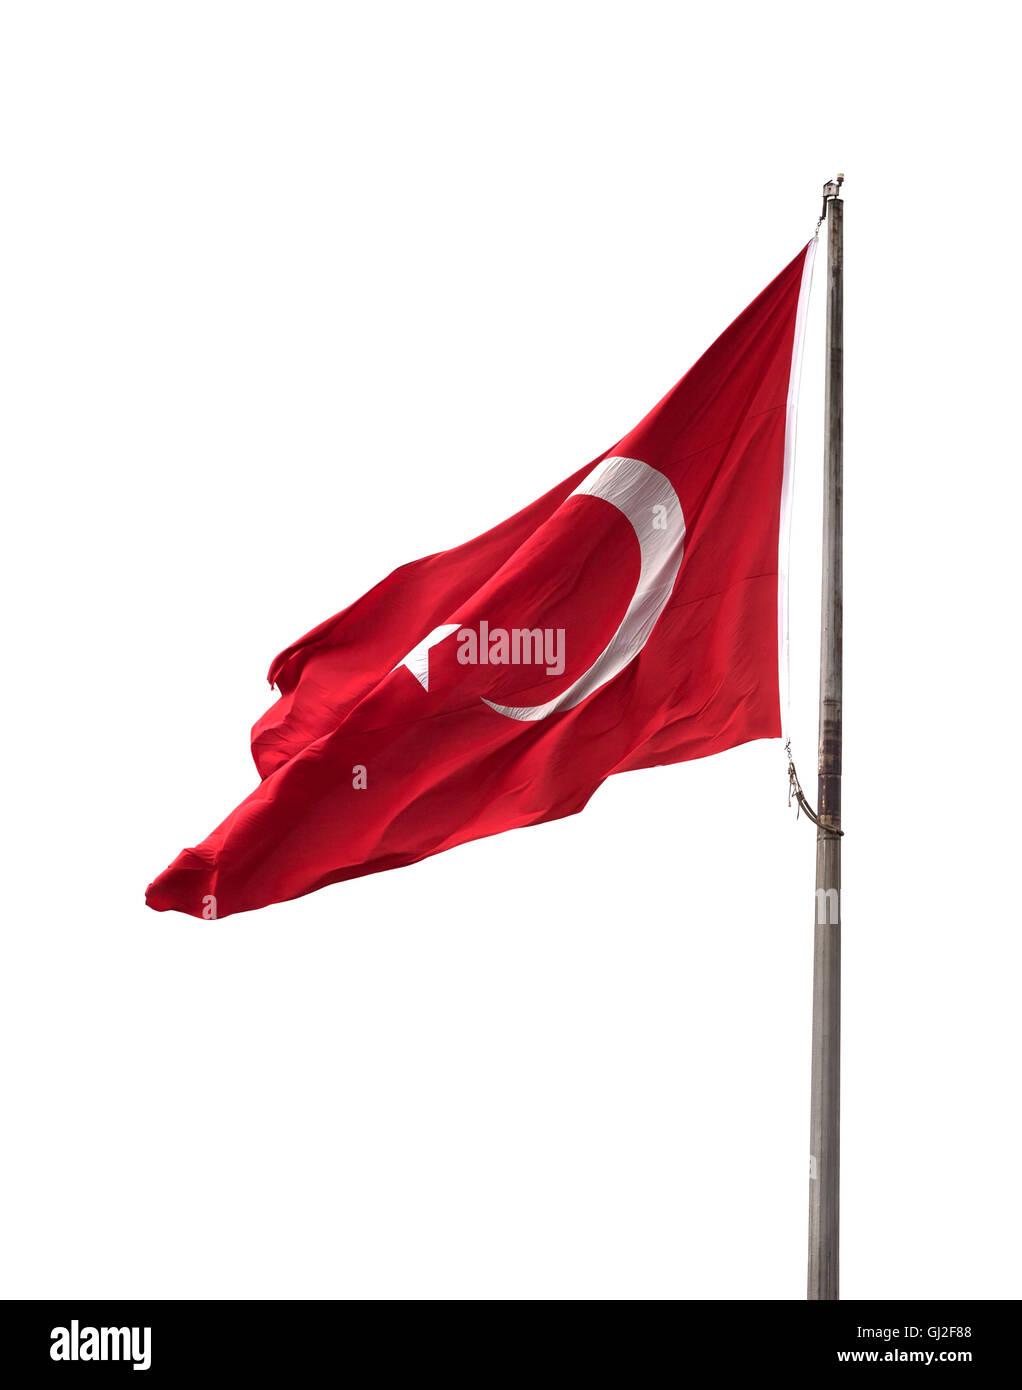 Turkish flag on flagpole waving in windy day. Isolated on white background. - Stock Image